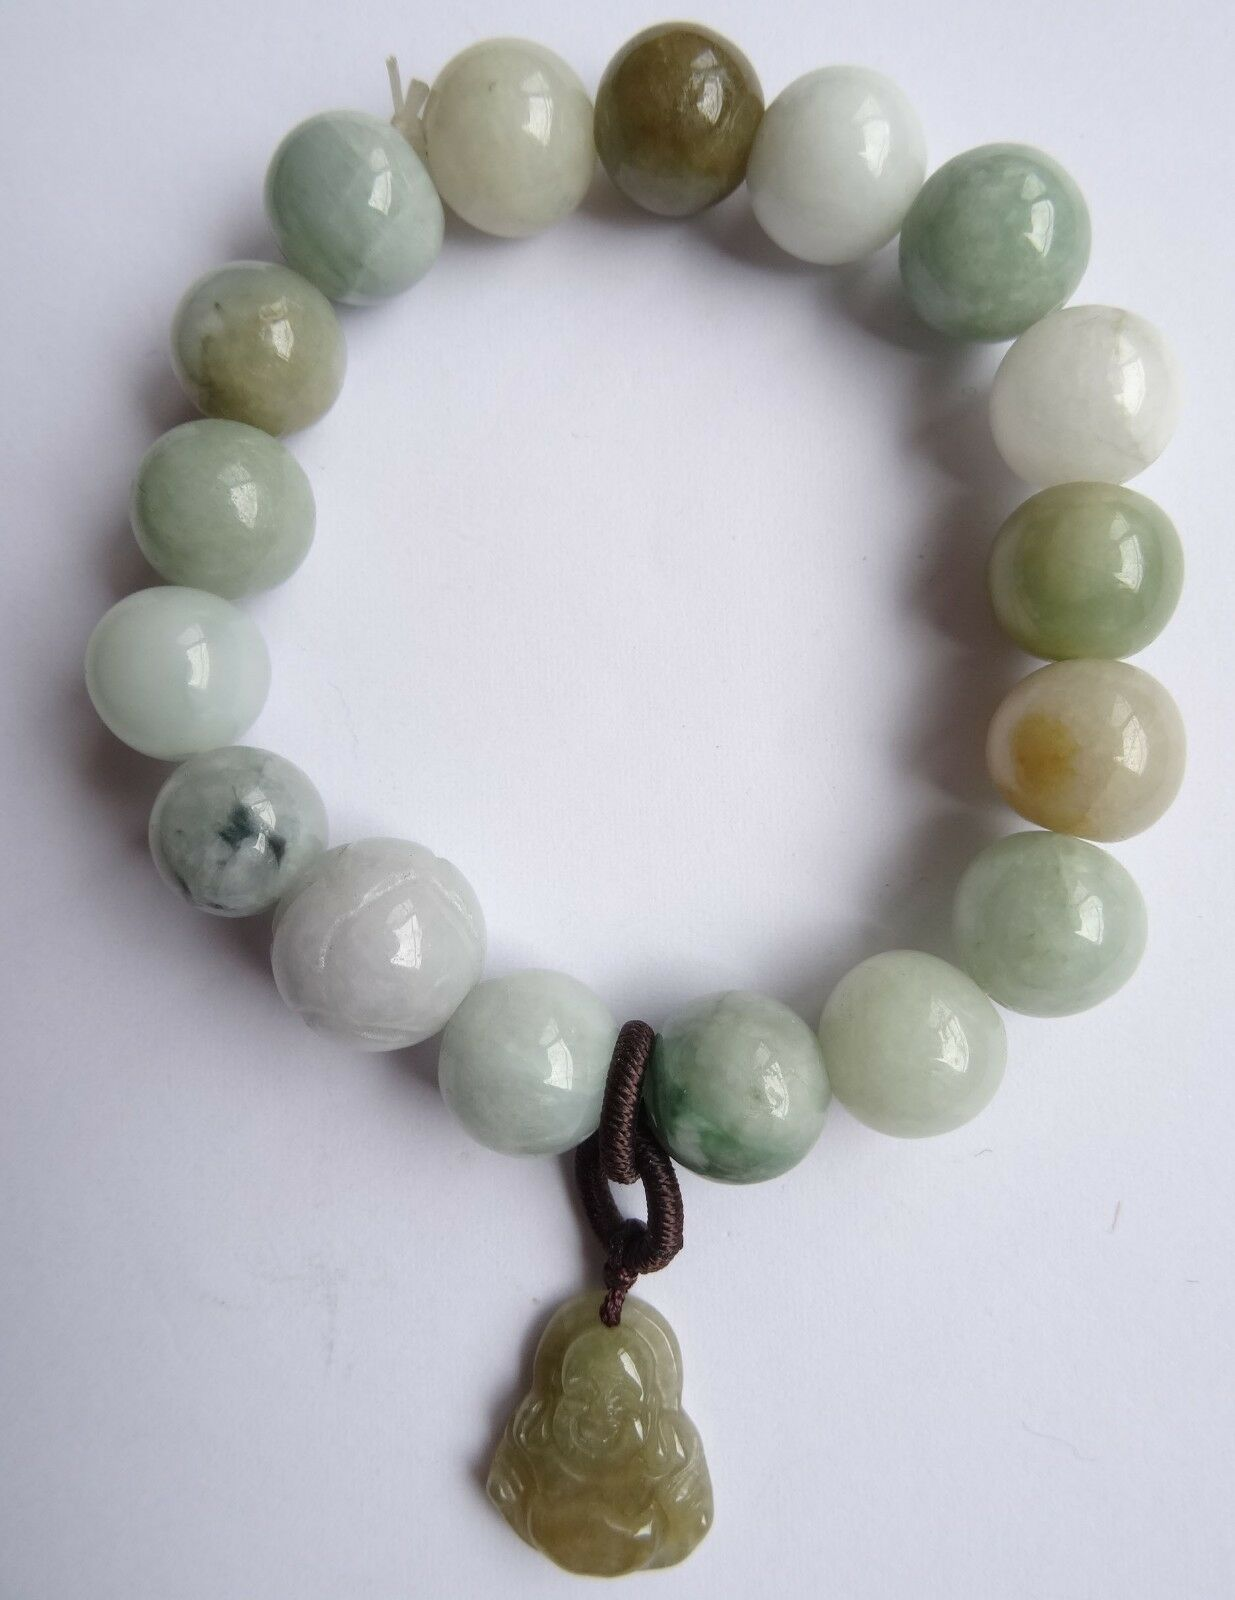 100% Pure Natural FeiCui Jade Maitreya Buddha Handmade Pearls Jewels Bracelet